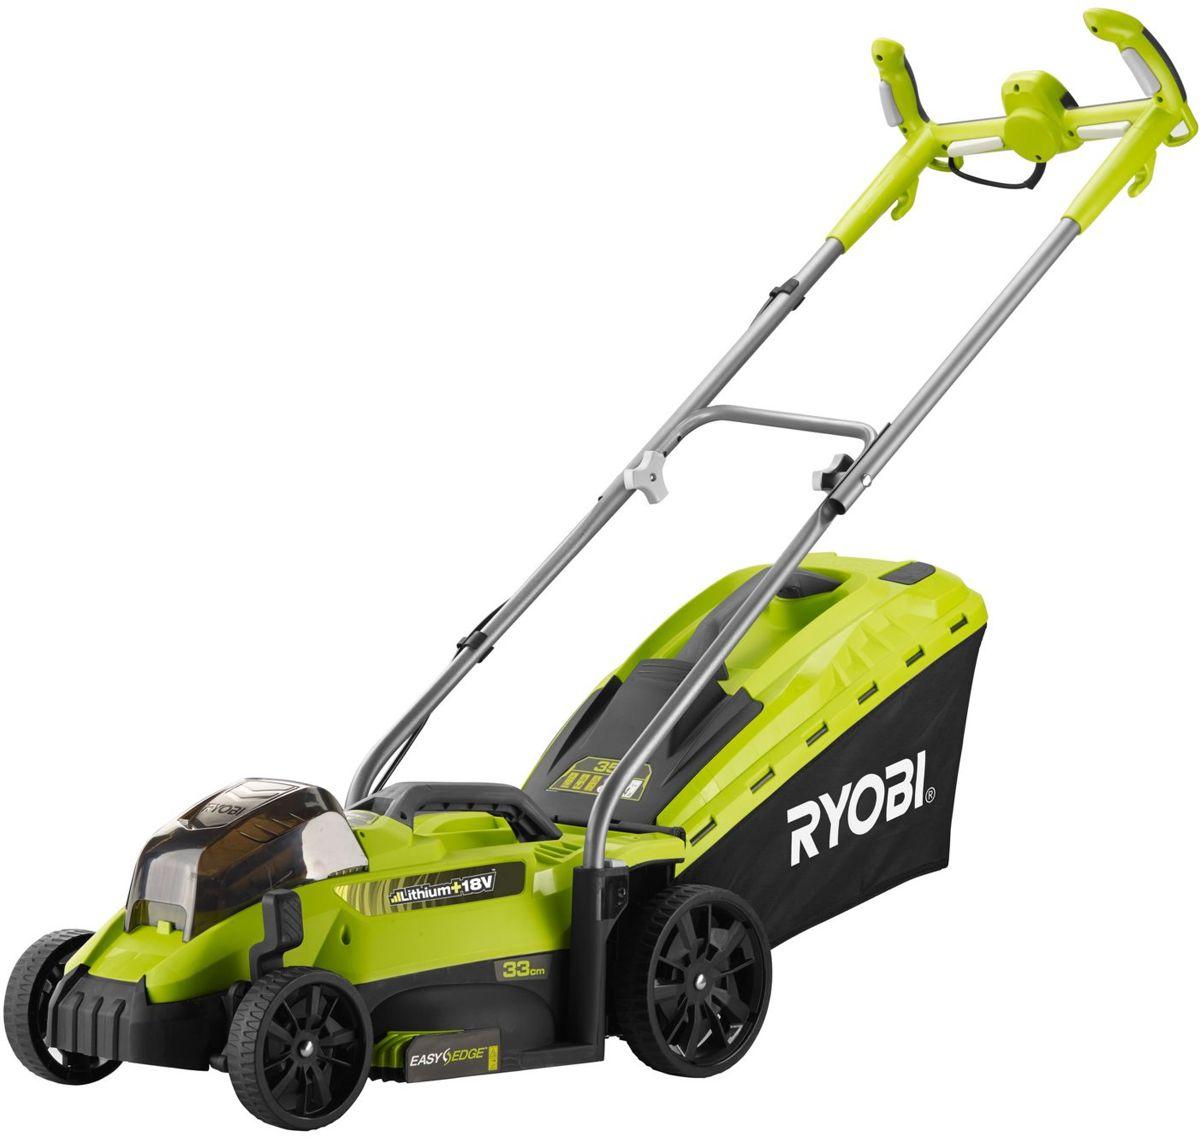 RYOBI ONE + 18V accu gazonmaaier grasmaaier 33 cm zonder accu's en lader